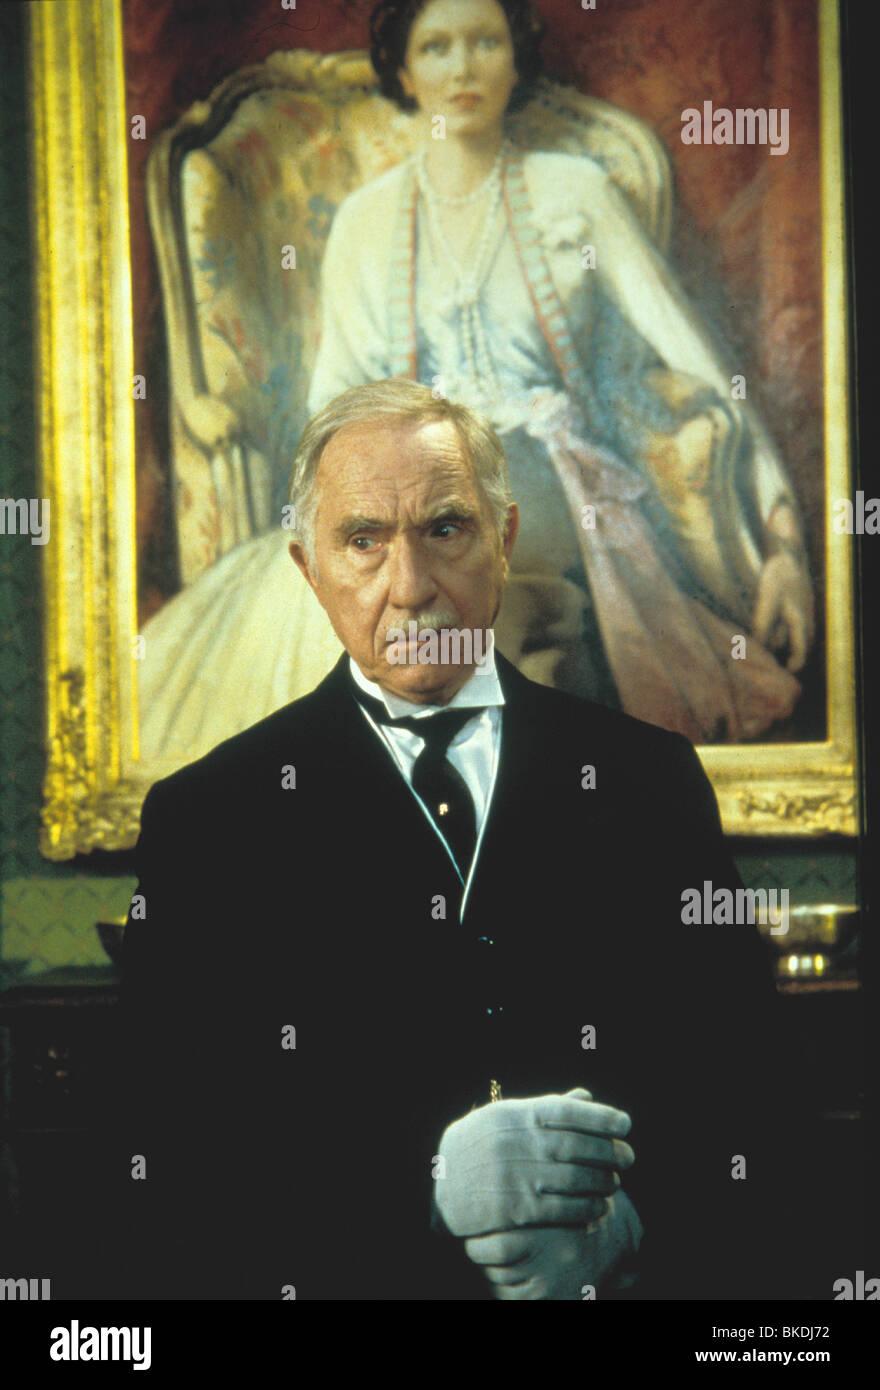 MADELINE -1998 NIGEL HAWTHORNE - Stock Image